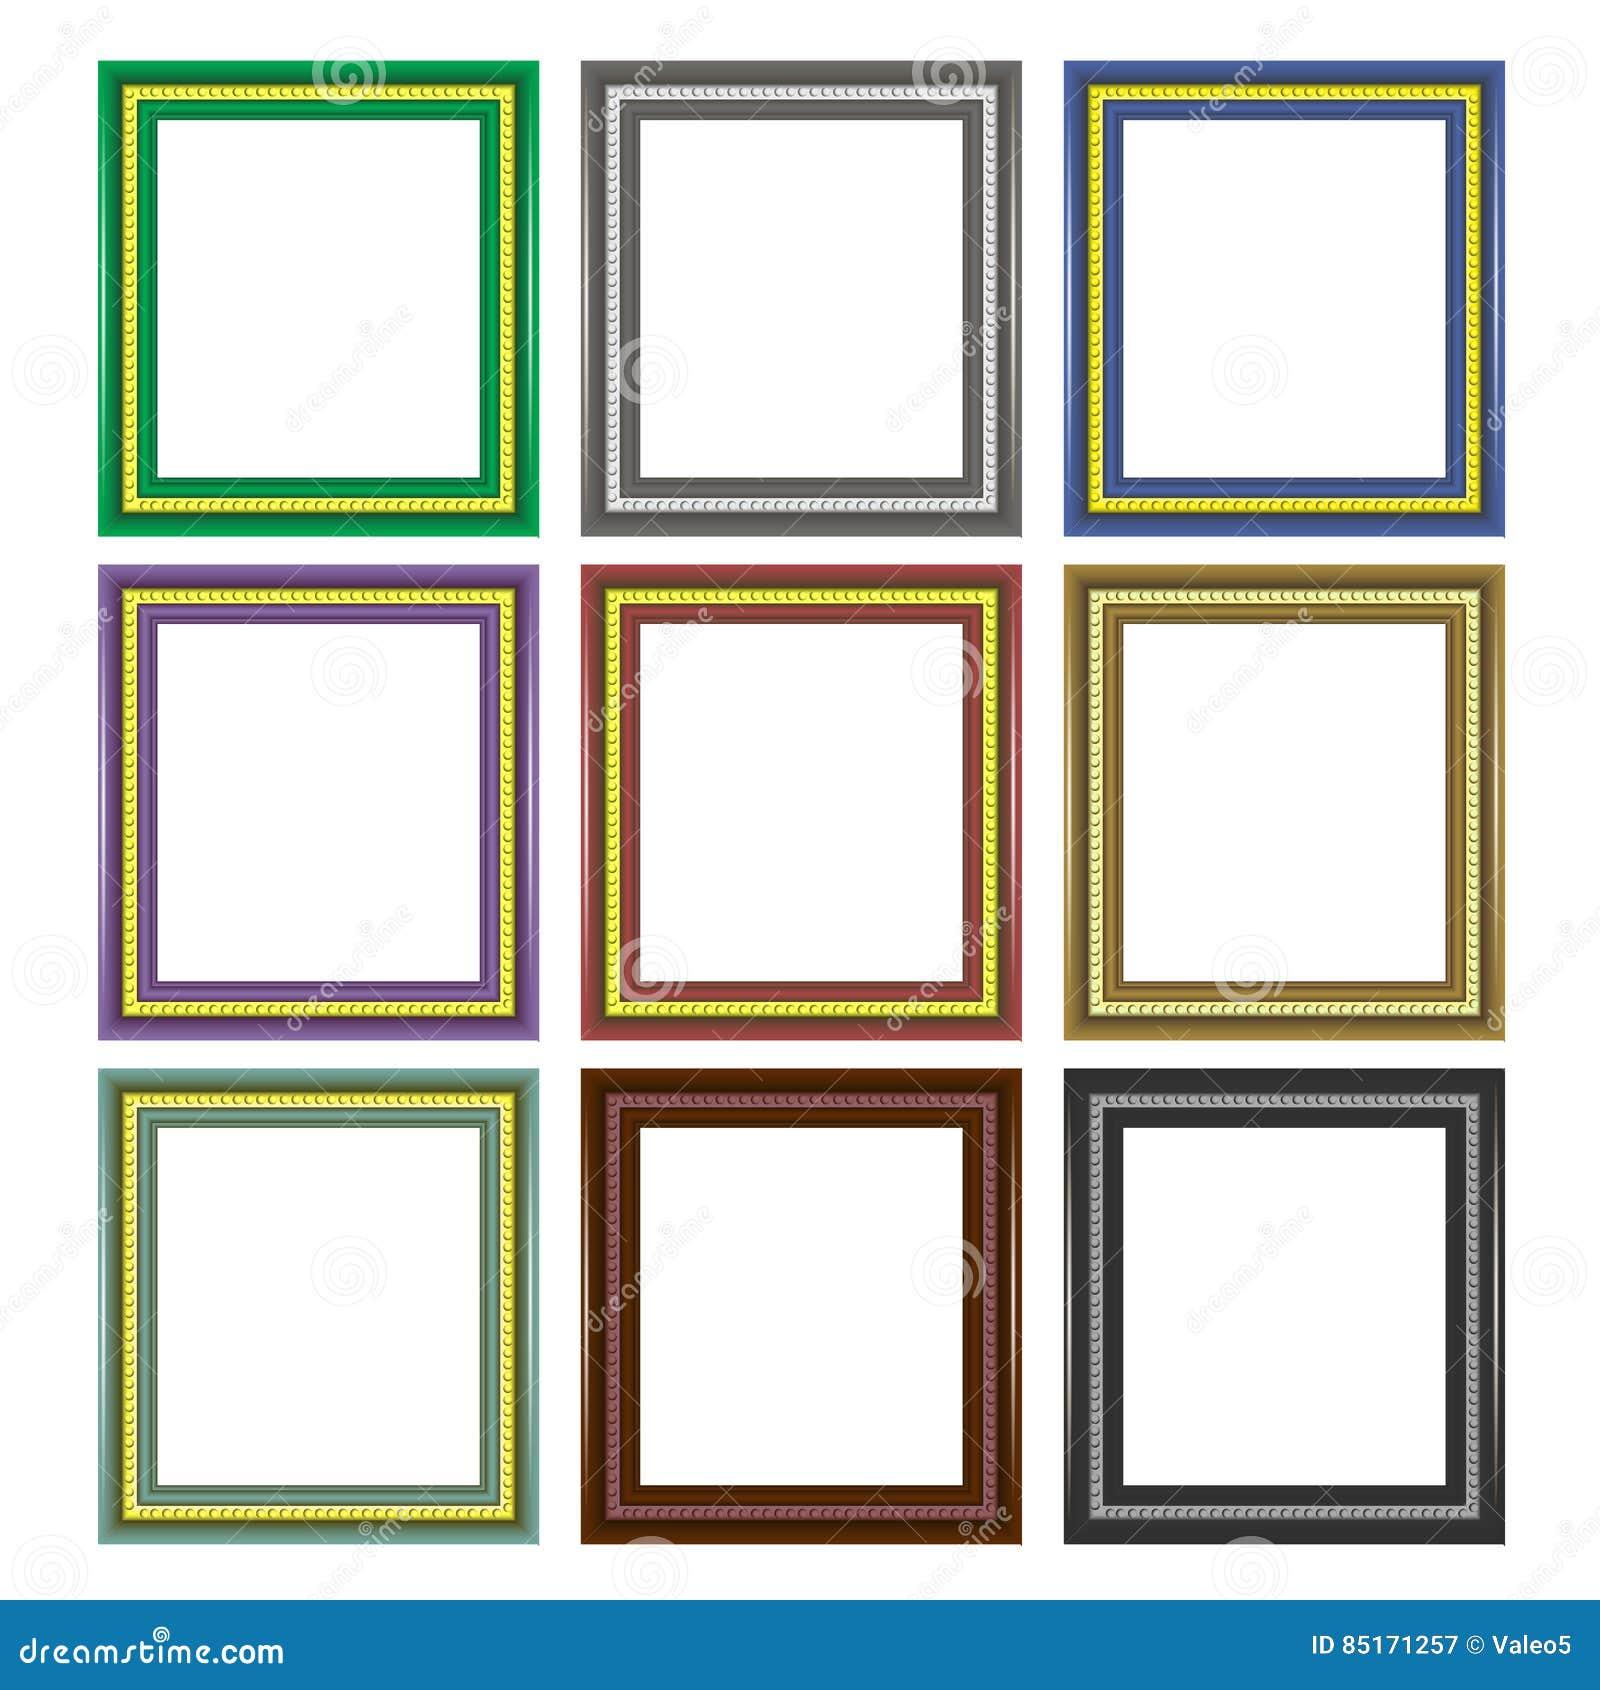 Set Of Colorful Wooden Frames Stock Vector - Illustration of grunge ...